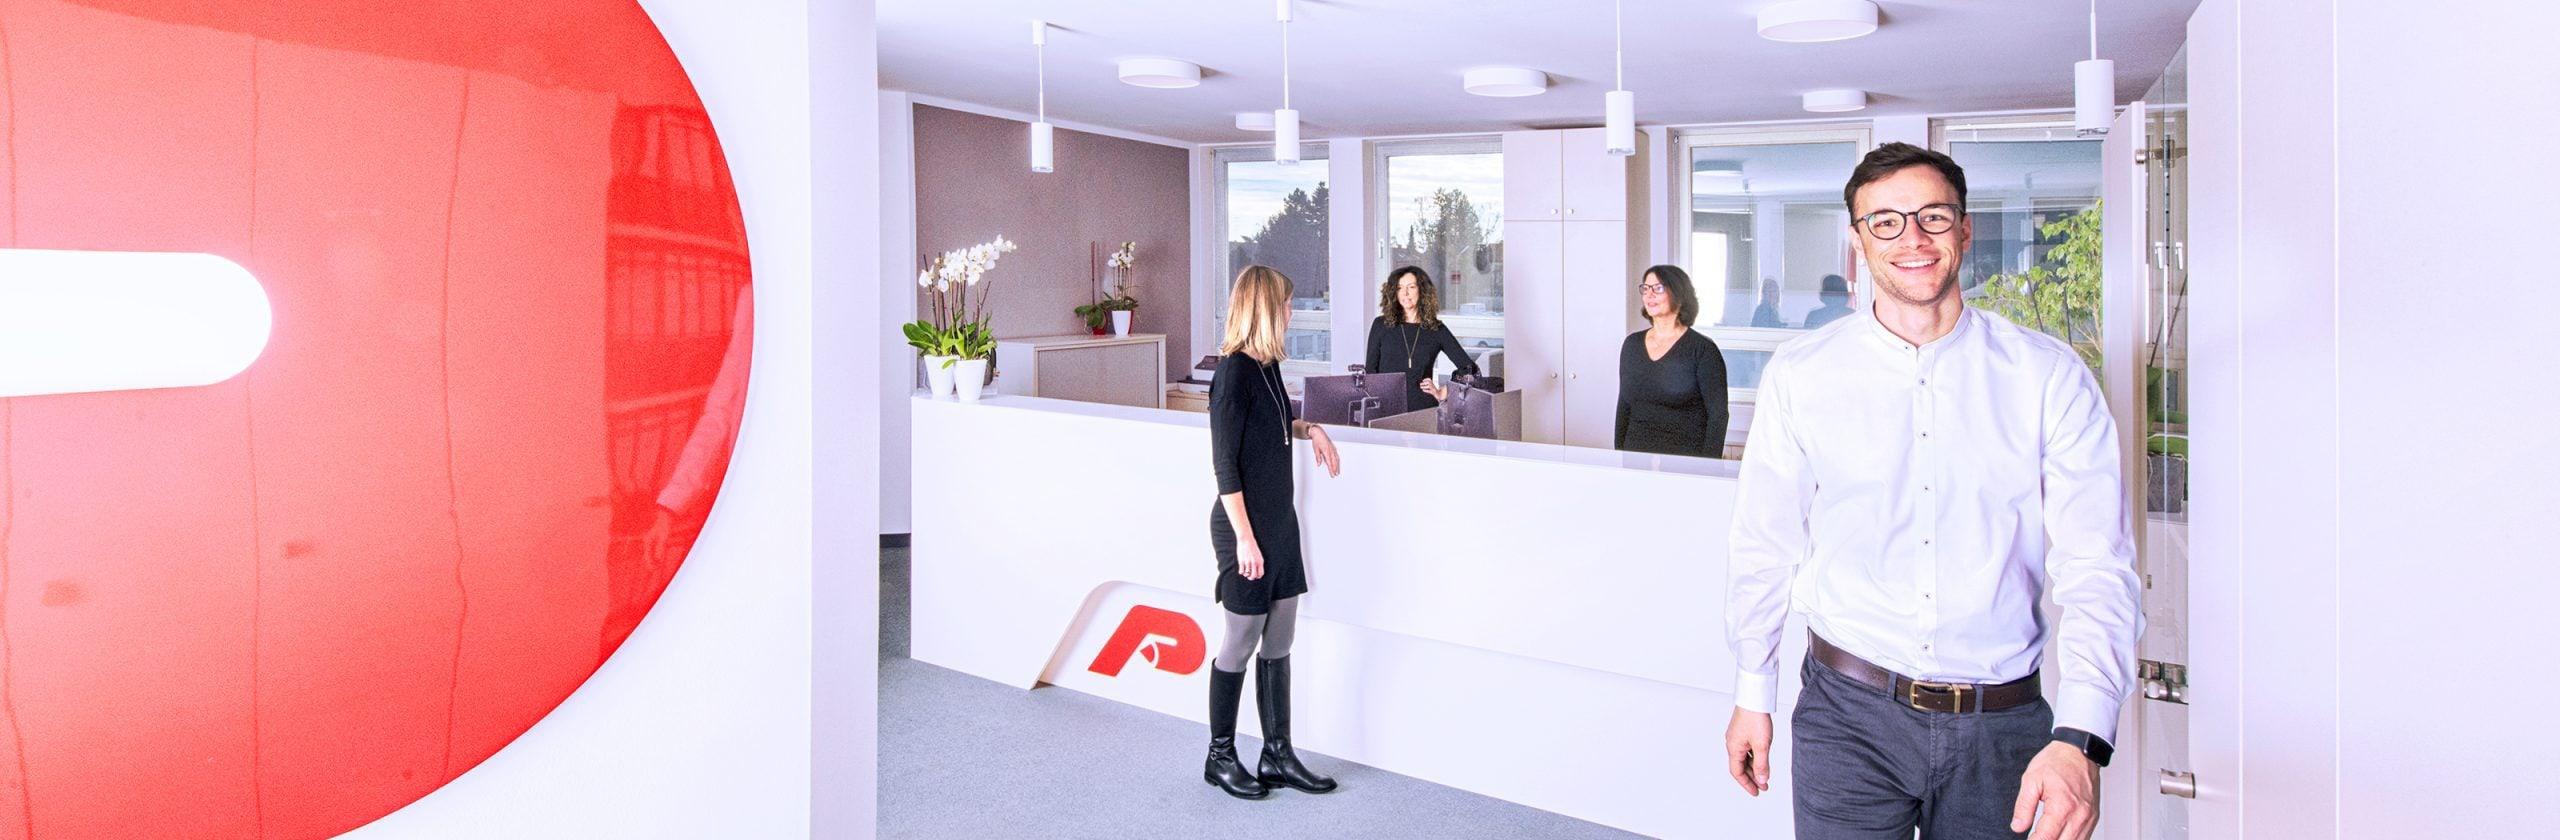 PEG-Gilching-Planungsbüro_Büroräume